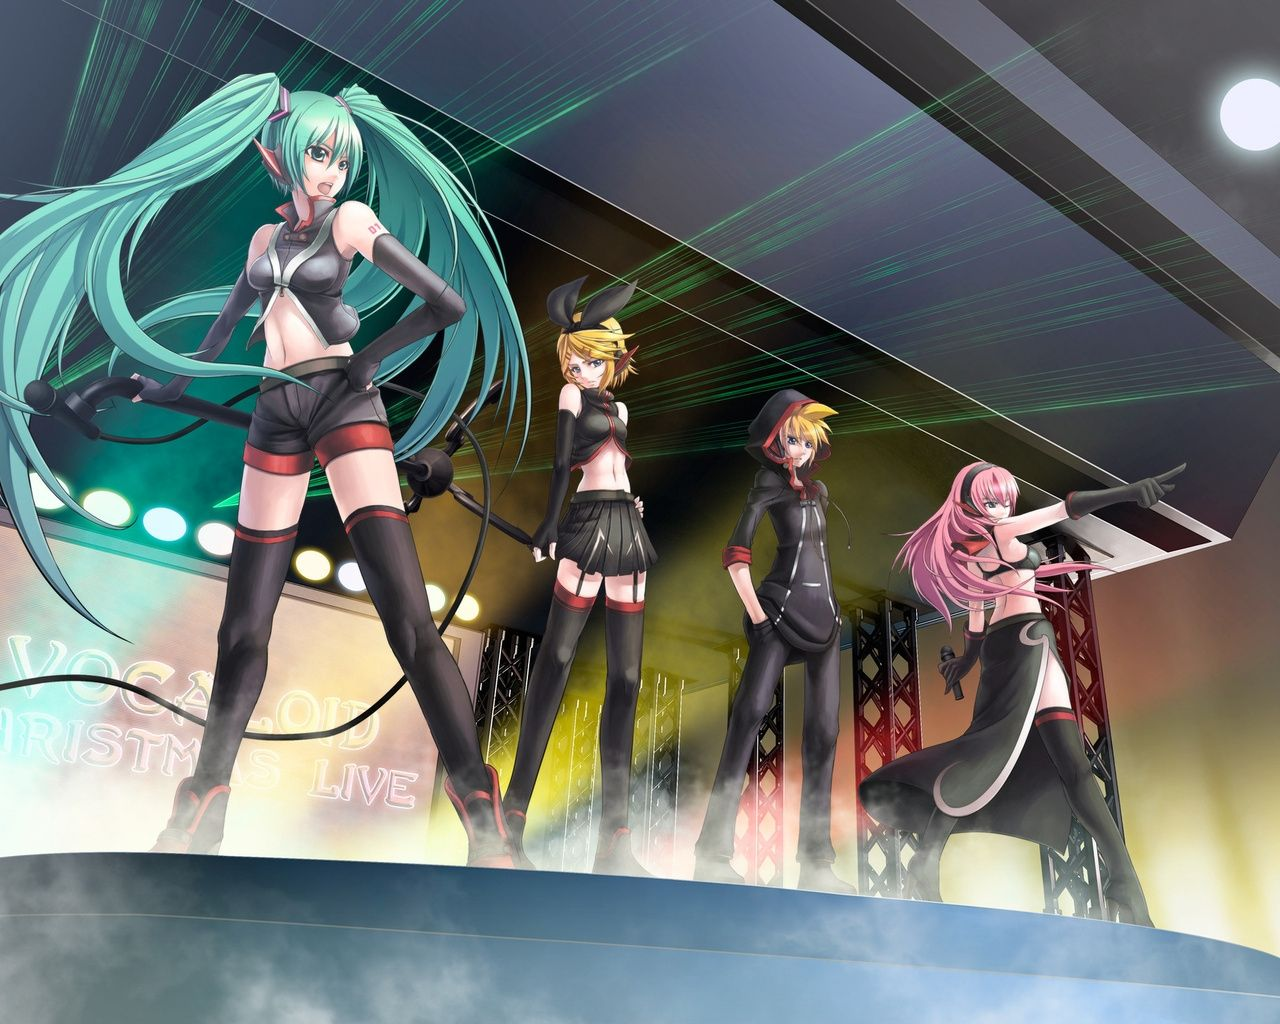 1280x1024 Wallpaper Anime Vocaloid Miku Girl Singer Stage